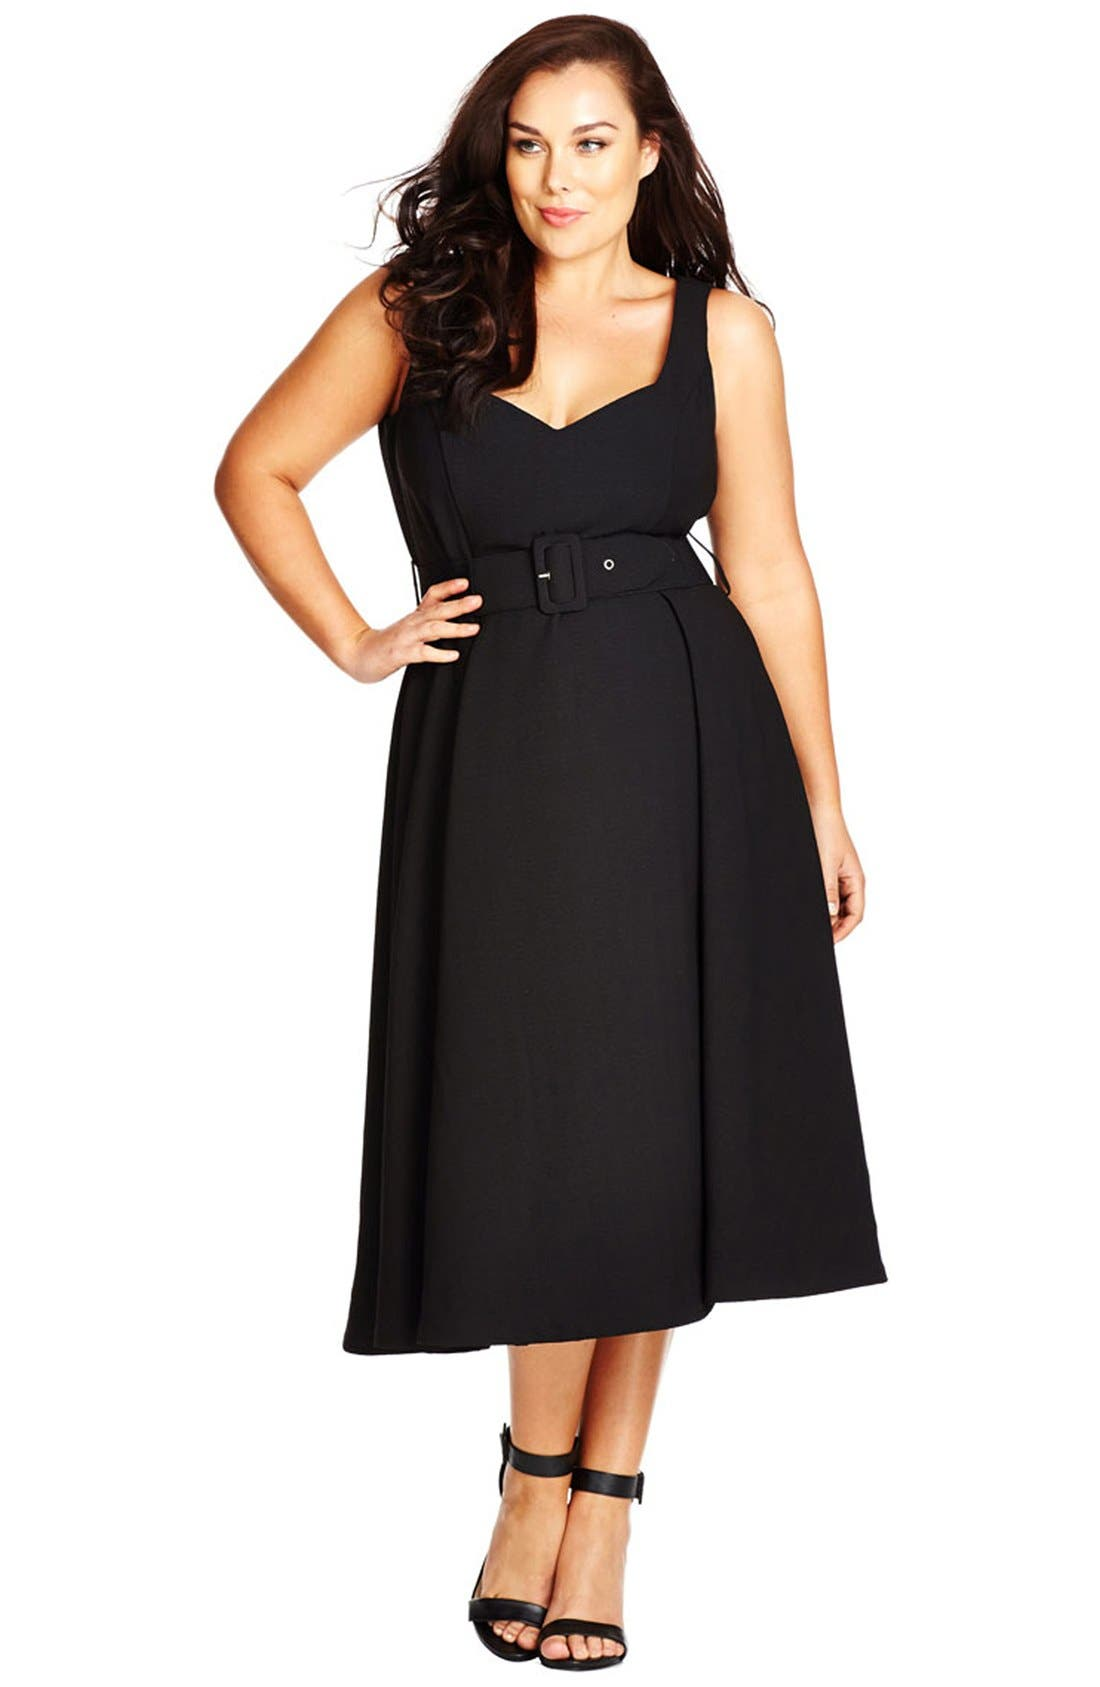 Belted Sweetheart Neck Tea Length Dress,                             Main thumbnail 1, color,                             Black